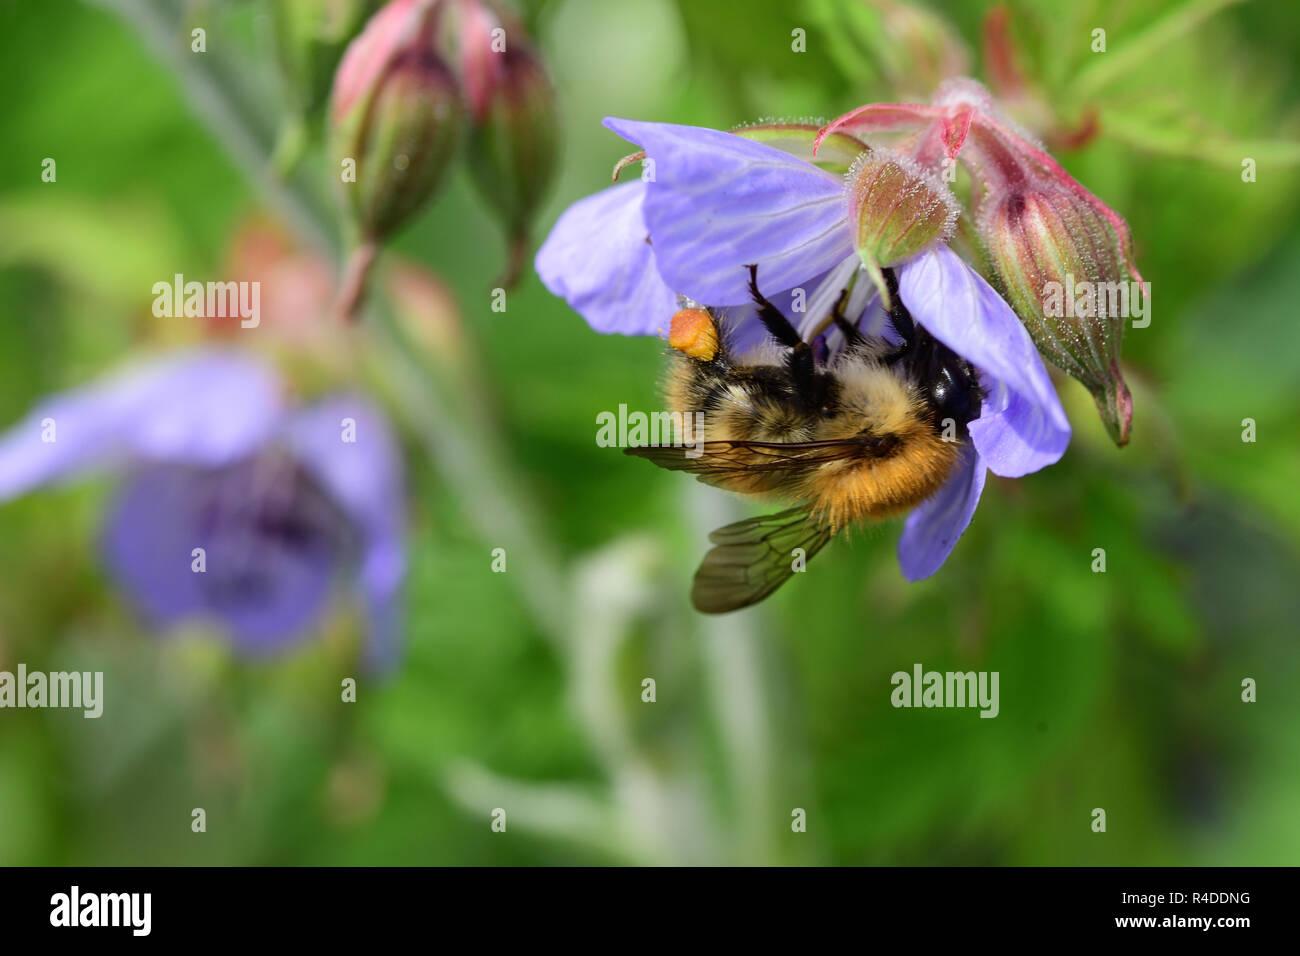 Macro shot of a bee polliating a geranium flower - Stock Image